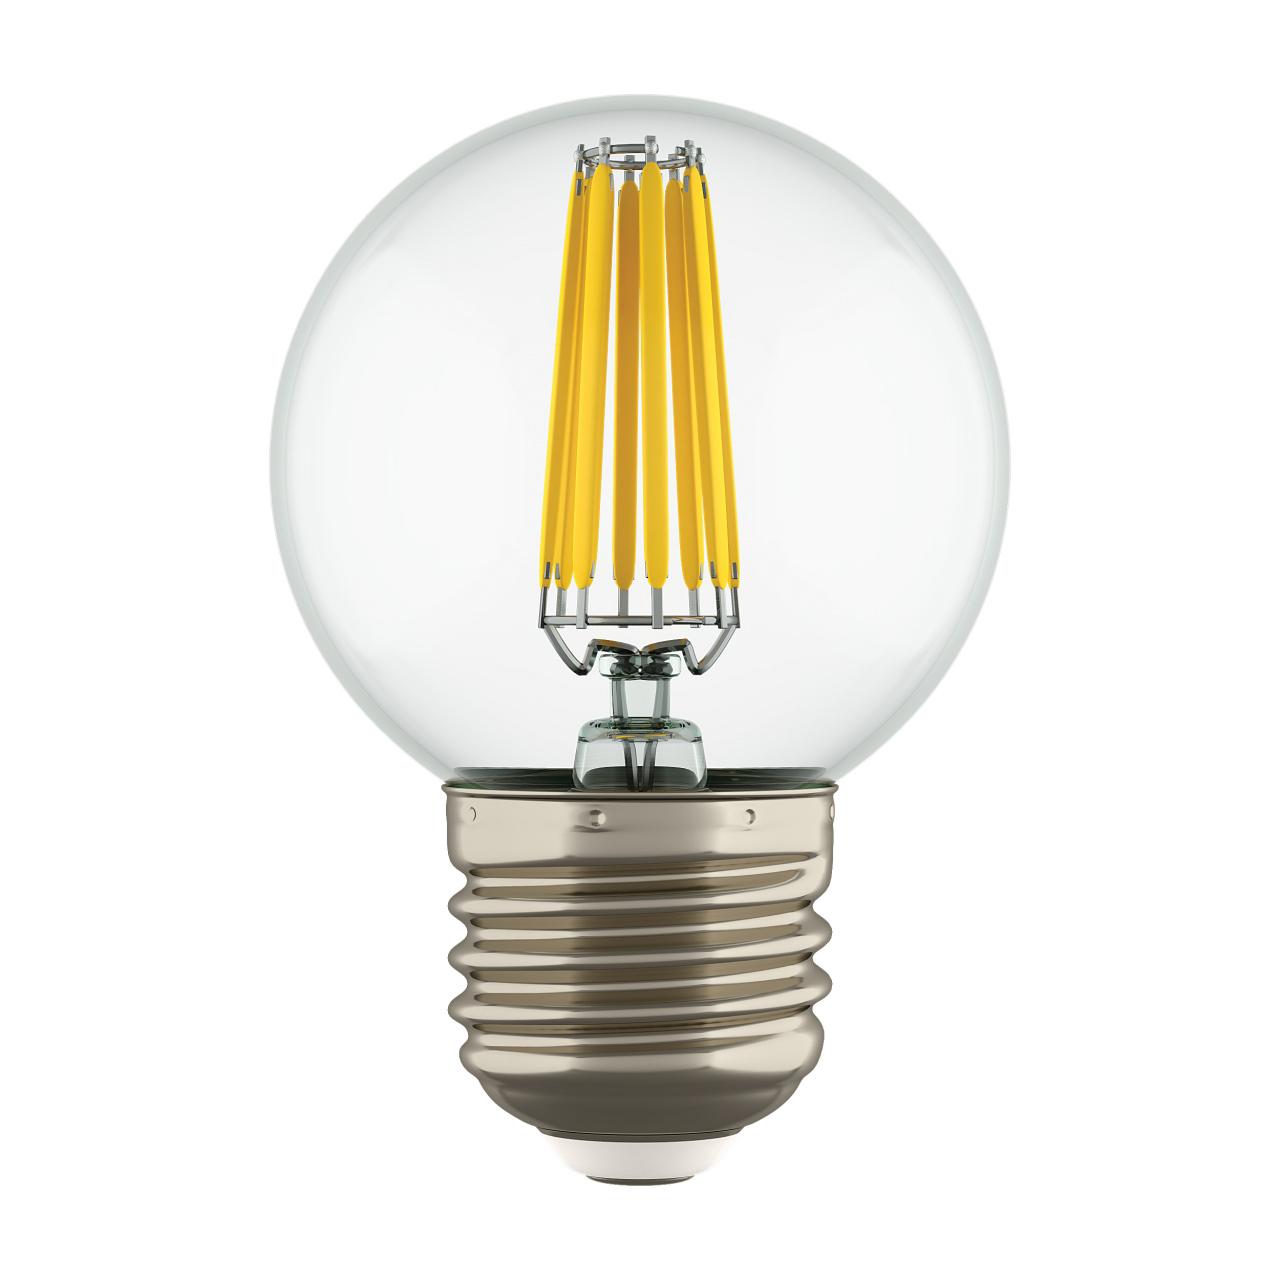 Лампа LED Filament 220V G50 E27 6W=65W 400-430LM 360G CL 3000K 30000H Lightstar 933822